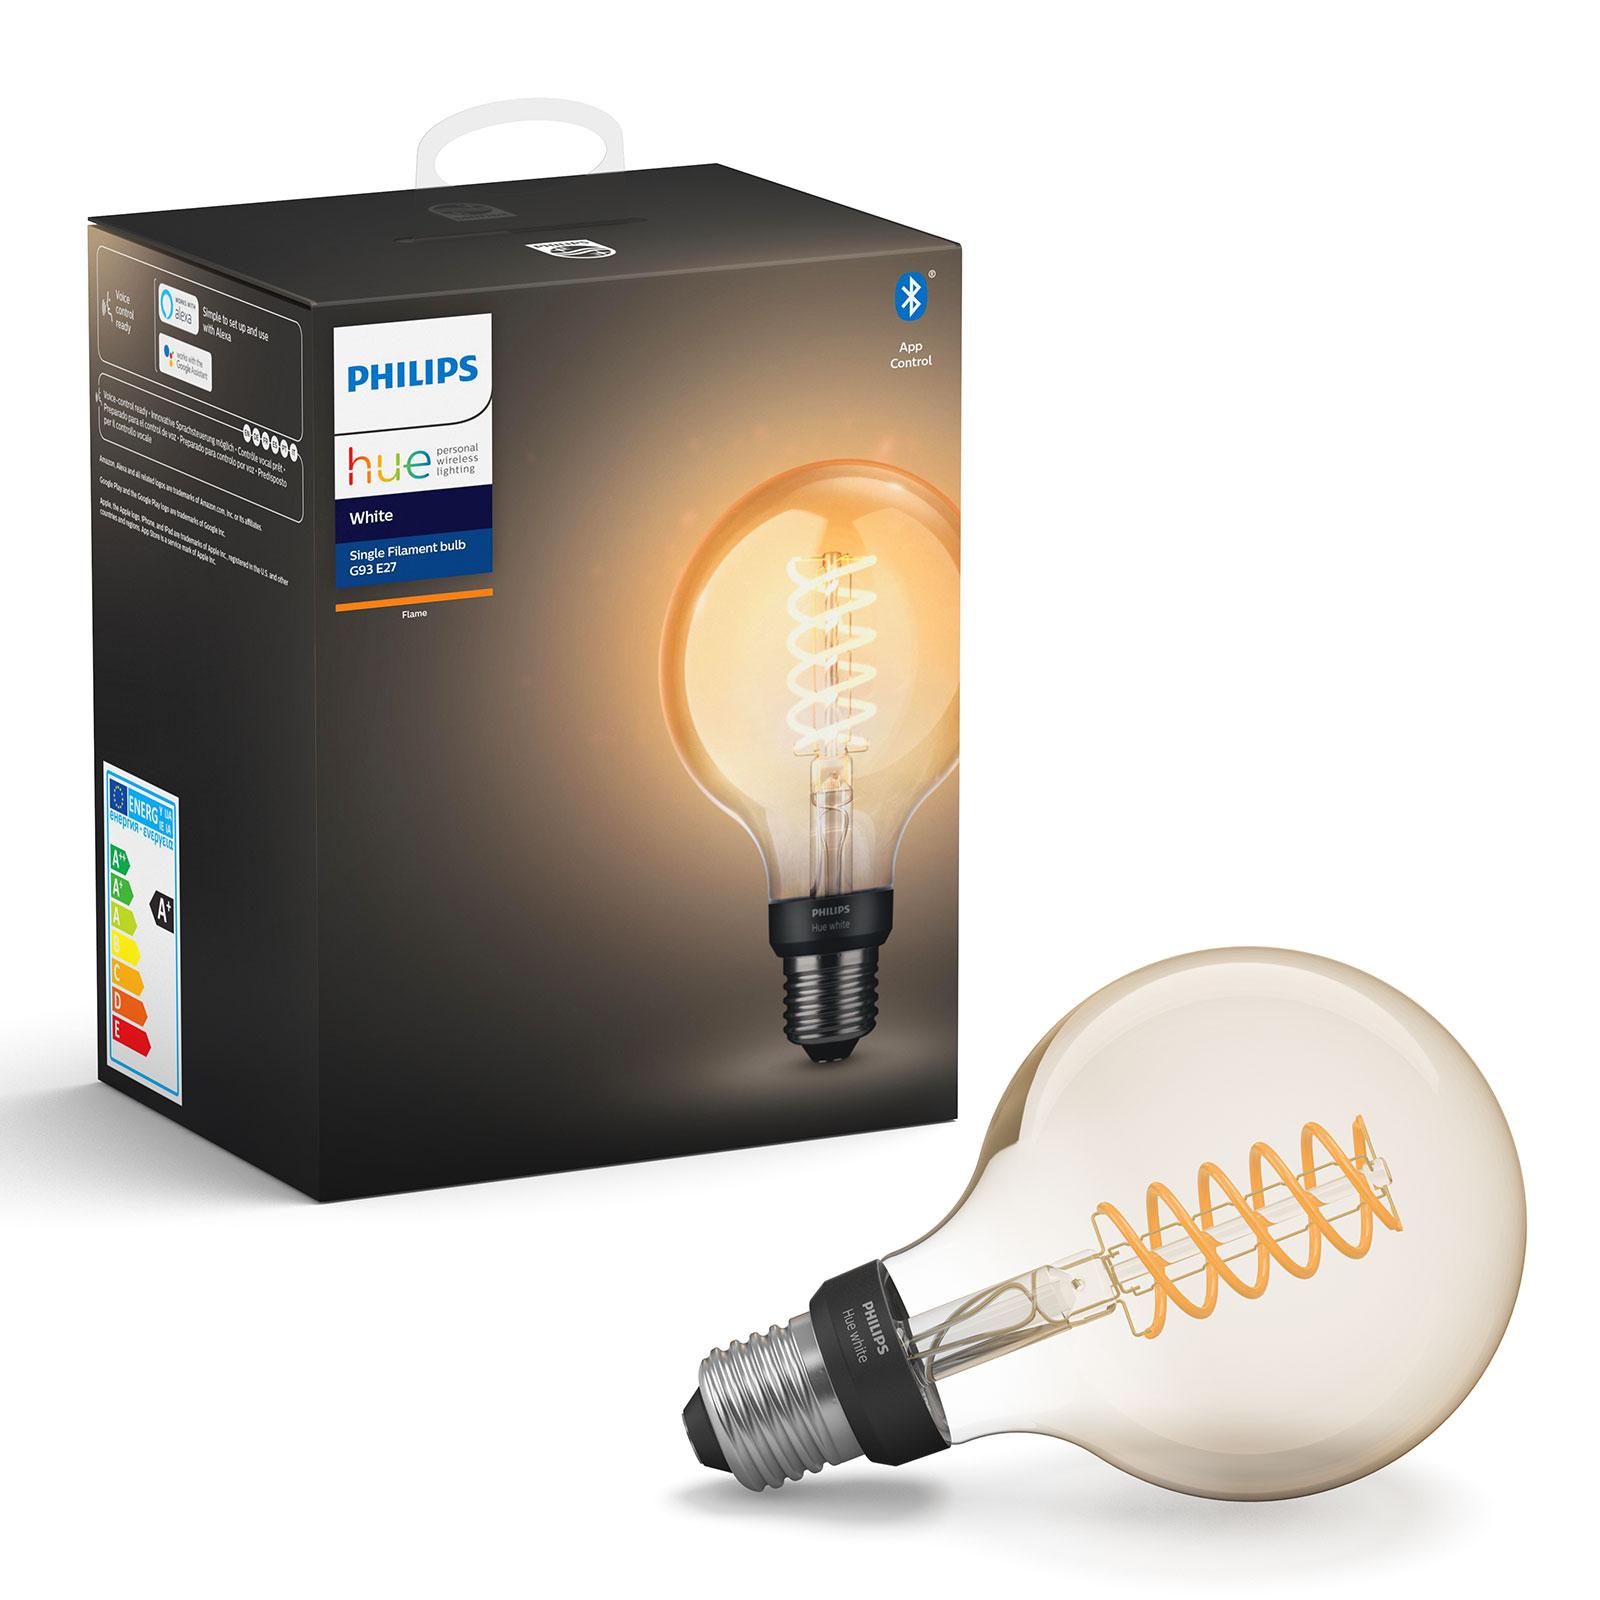 tint lampen mit app ansteuern